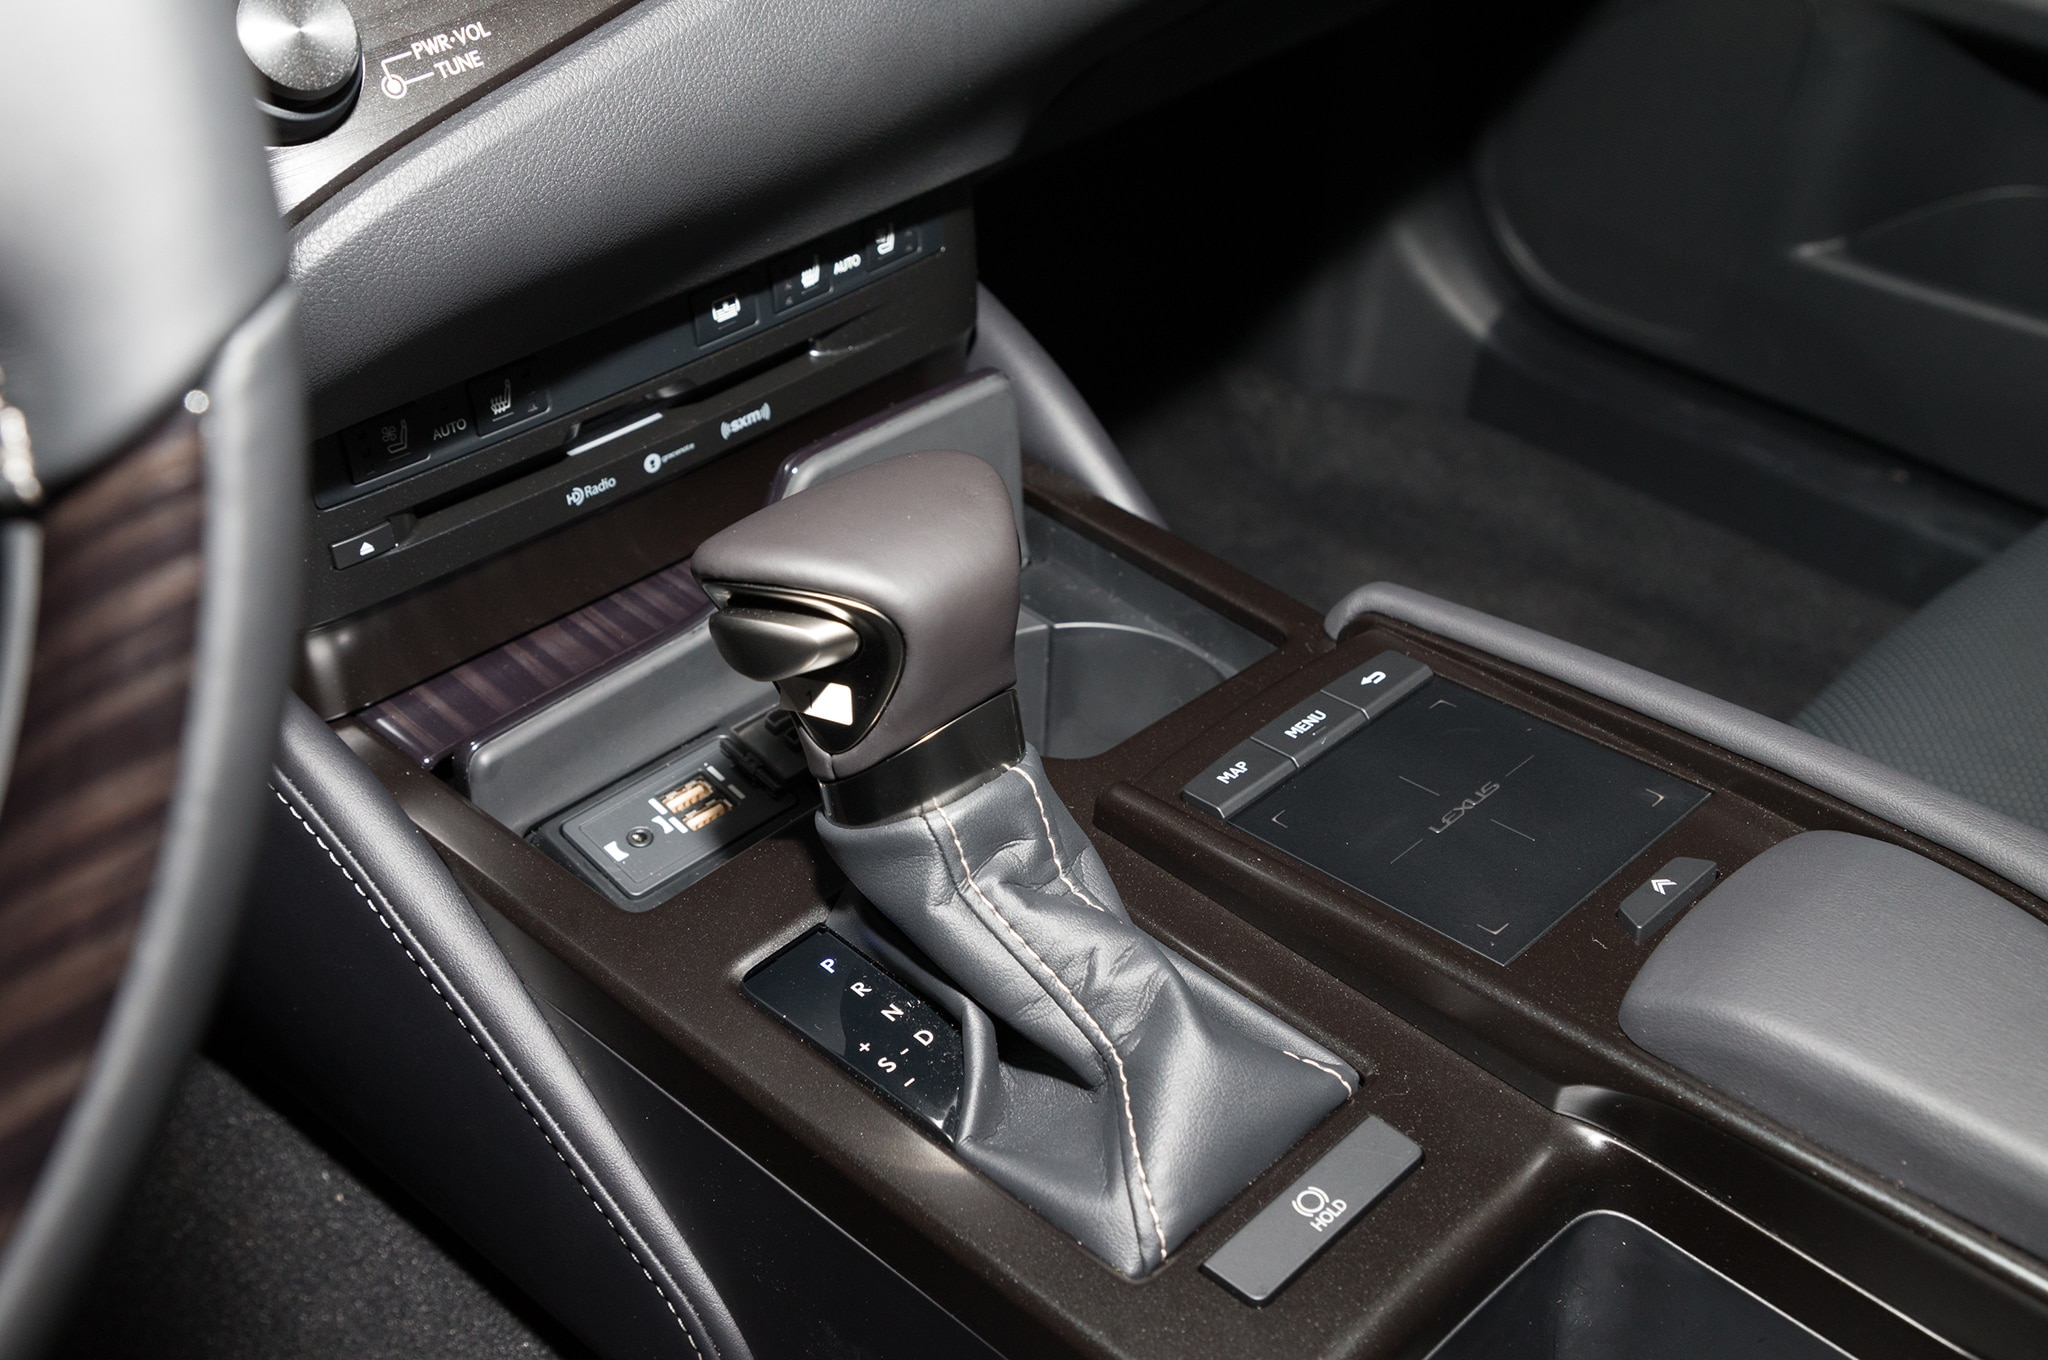 2019 Lexus Es Makes Double Debut In Palos Verdes And